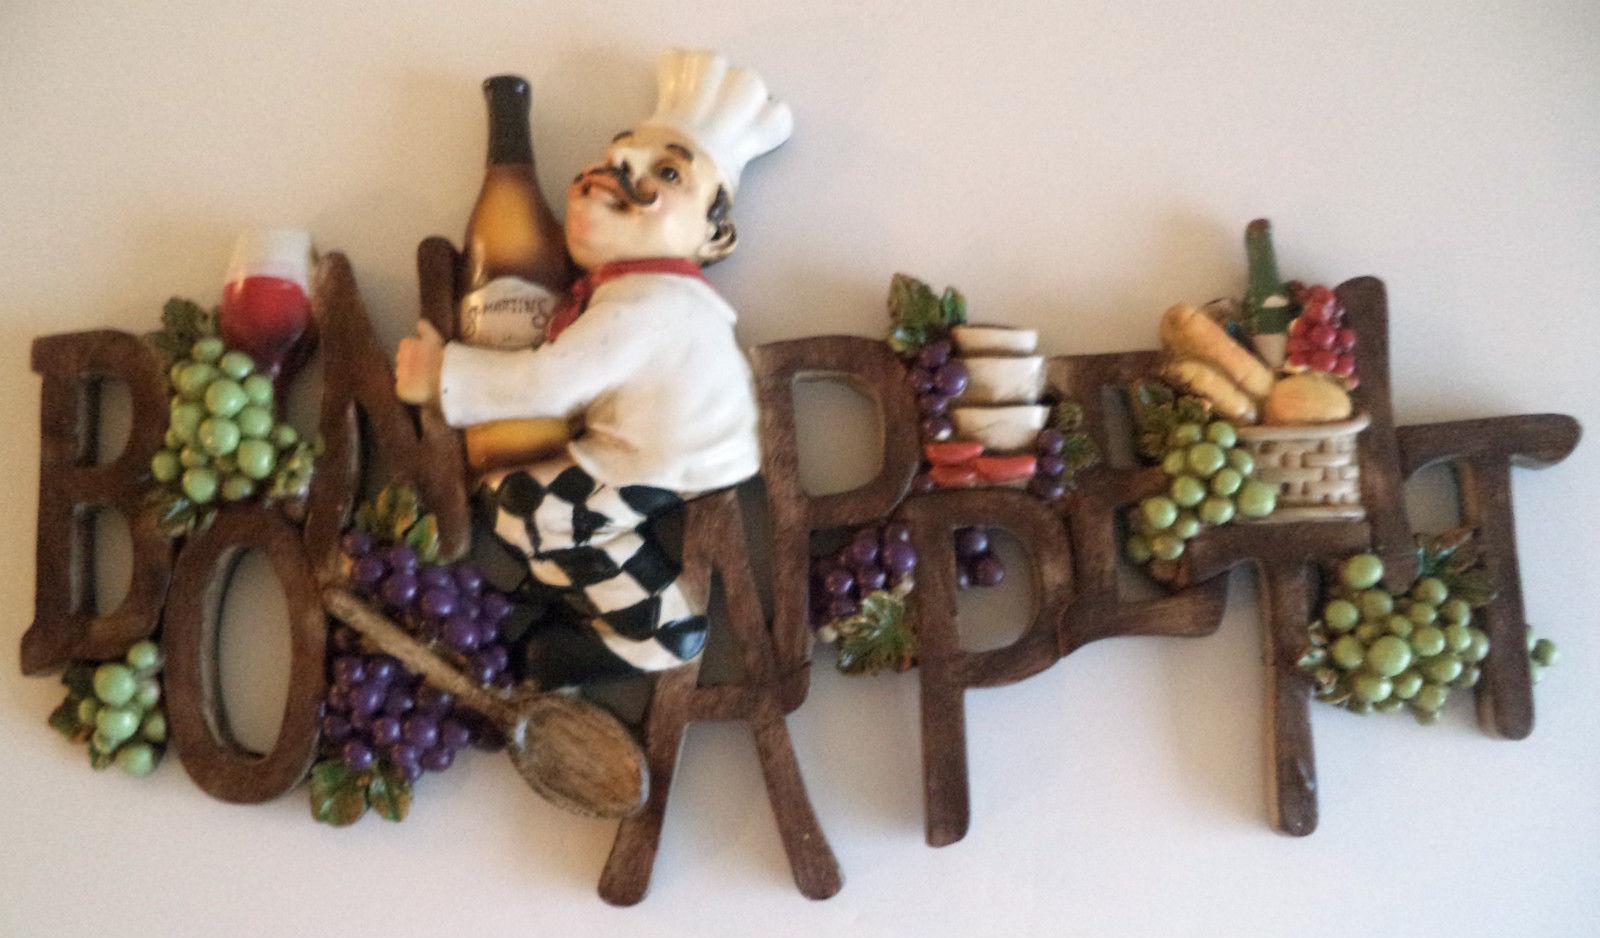 grapes and wine kitchen decor ceramic drawer pulls new bon appetit wall plaque bottles art